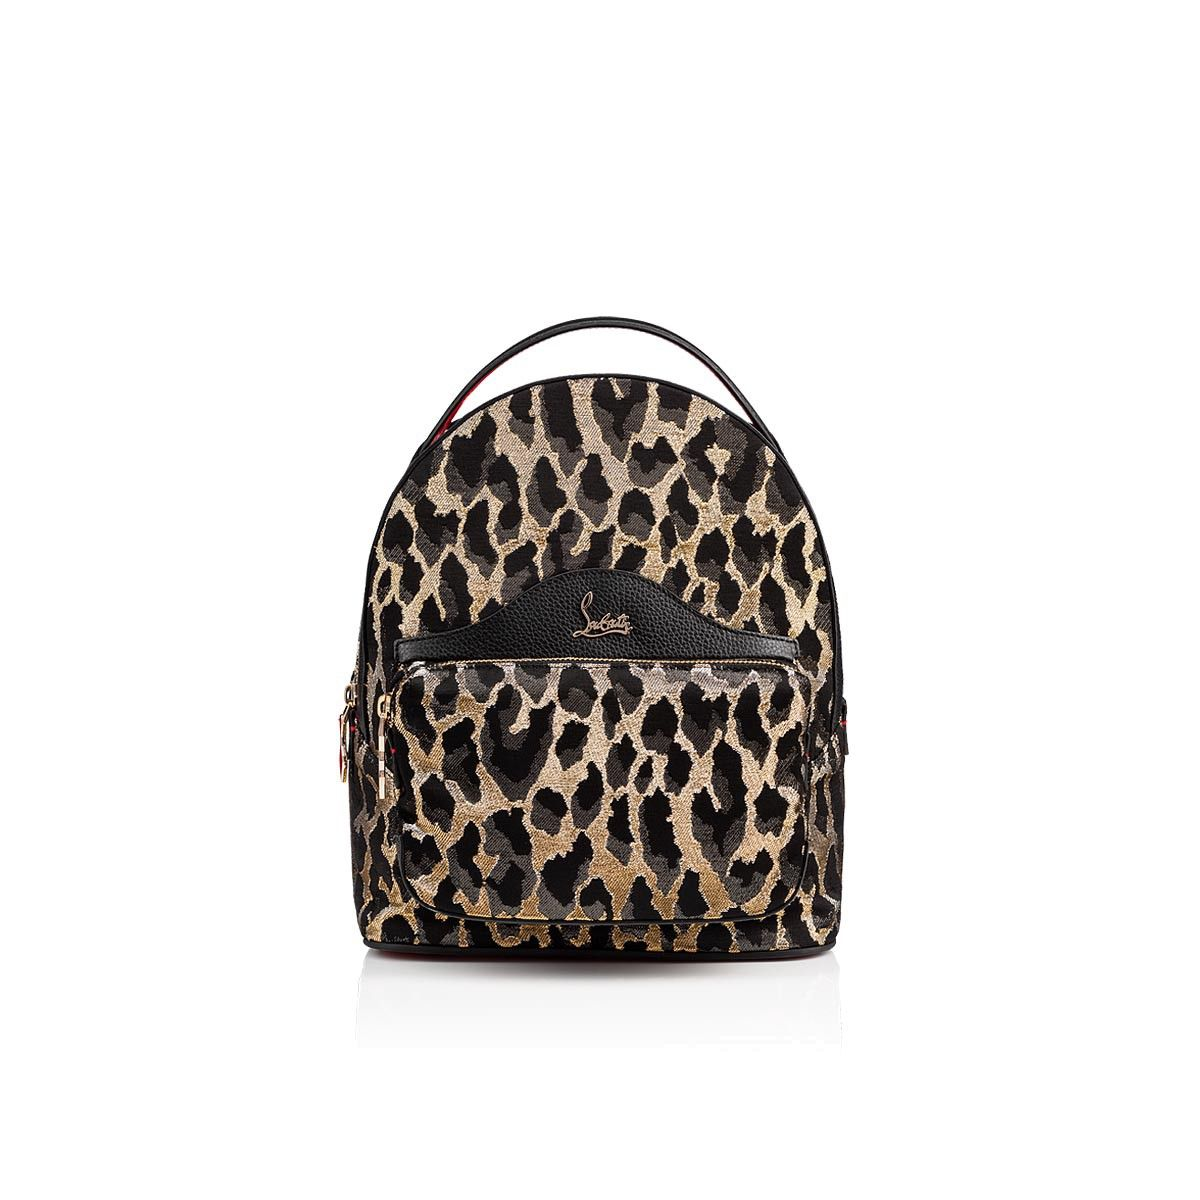 6a9d2cea19a0 Bags - Backloubi Small Backpack - Christian Louboutin